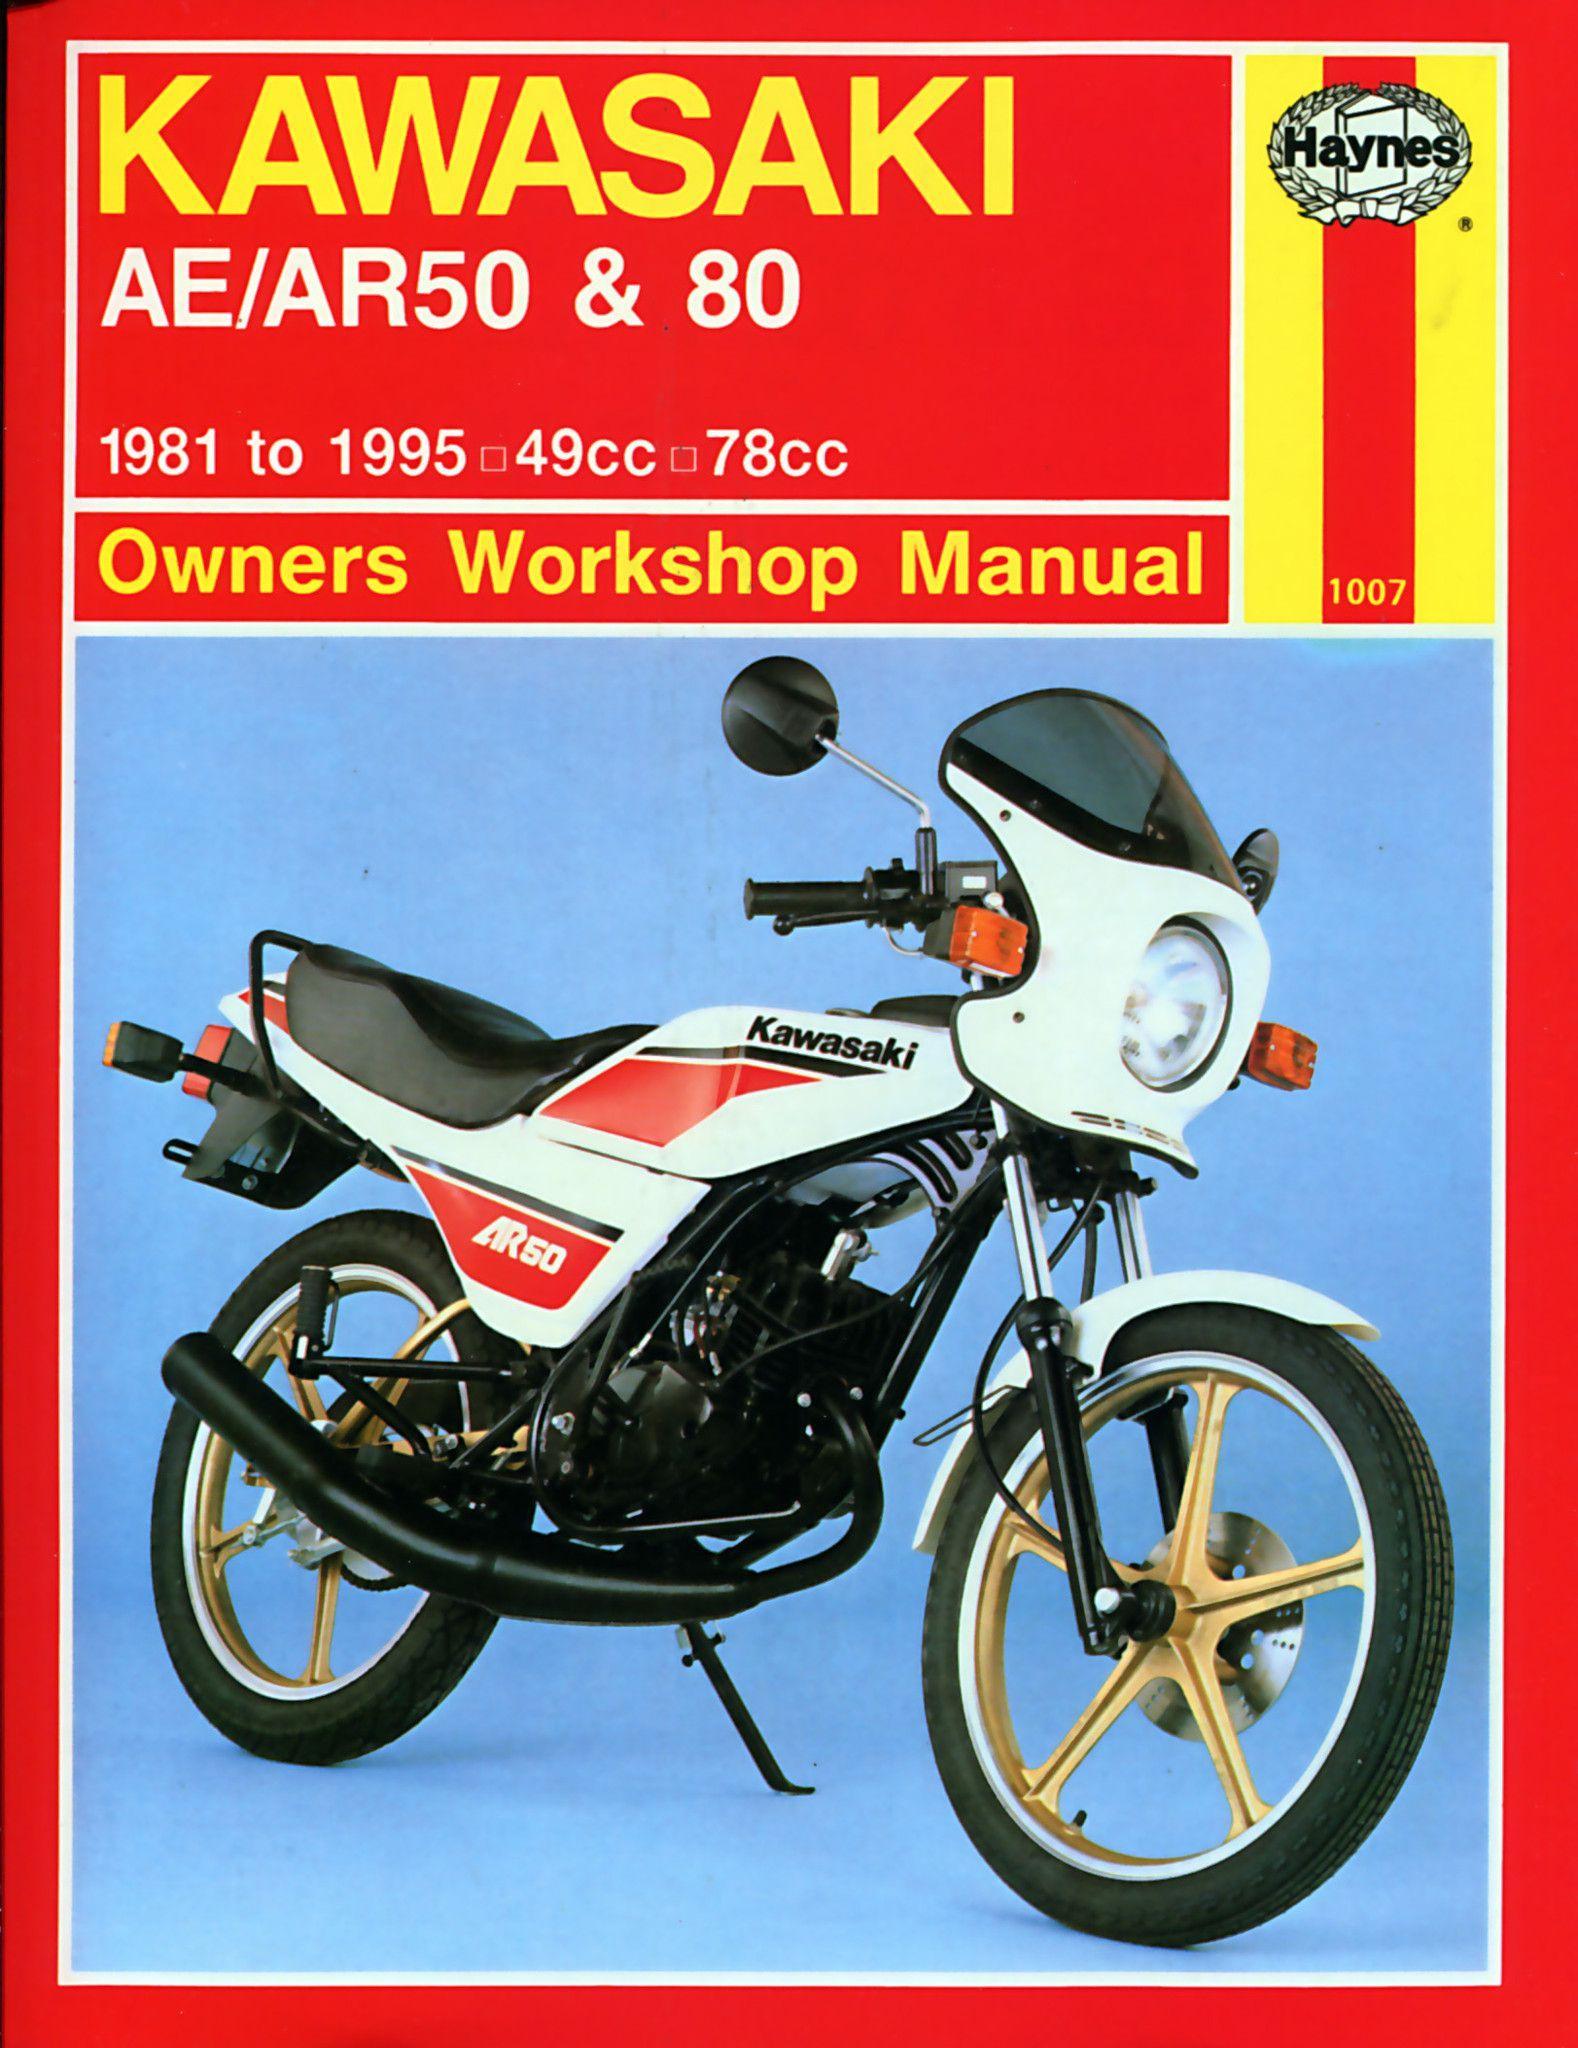 haynes m1007 repair manual for 1981-82 kawasaki ar50 and ar80